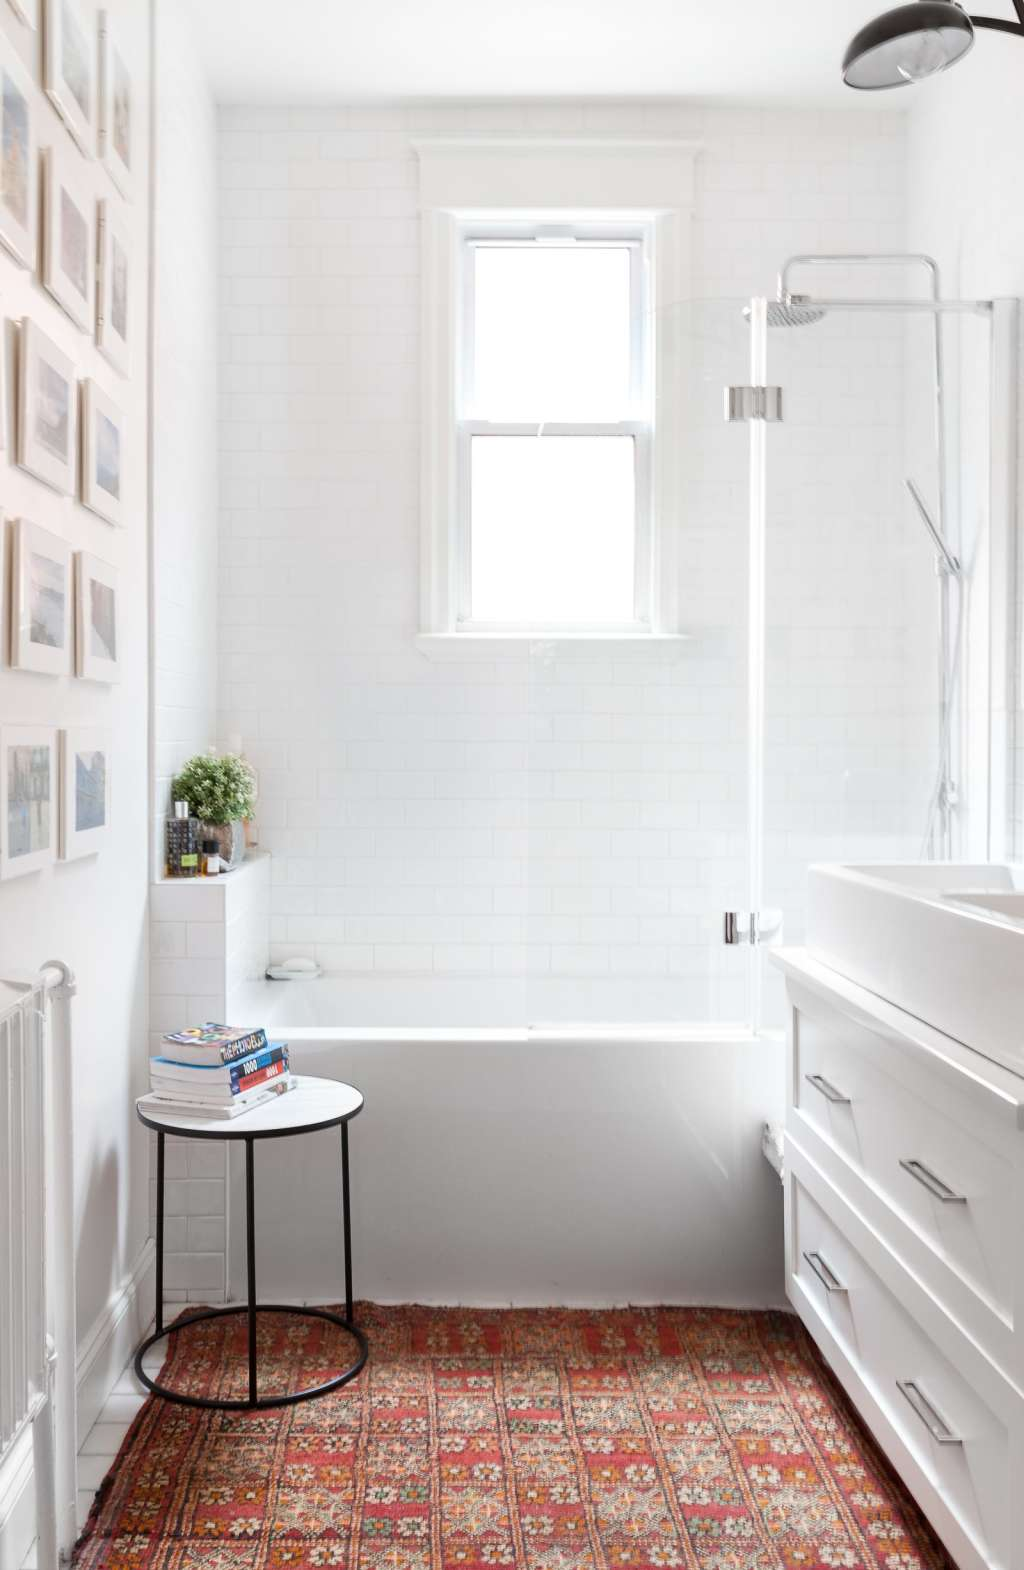 Small Bathroom Design Ideas - 7 Beautiful Remodels ... on Bathroom Ideas Apartment  id=72715